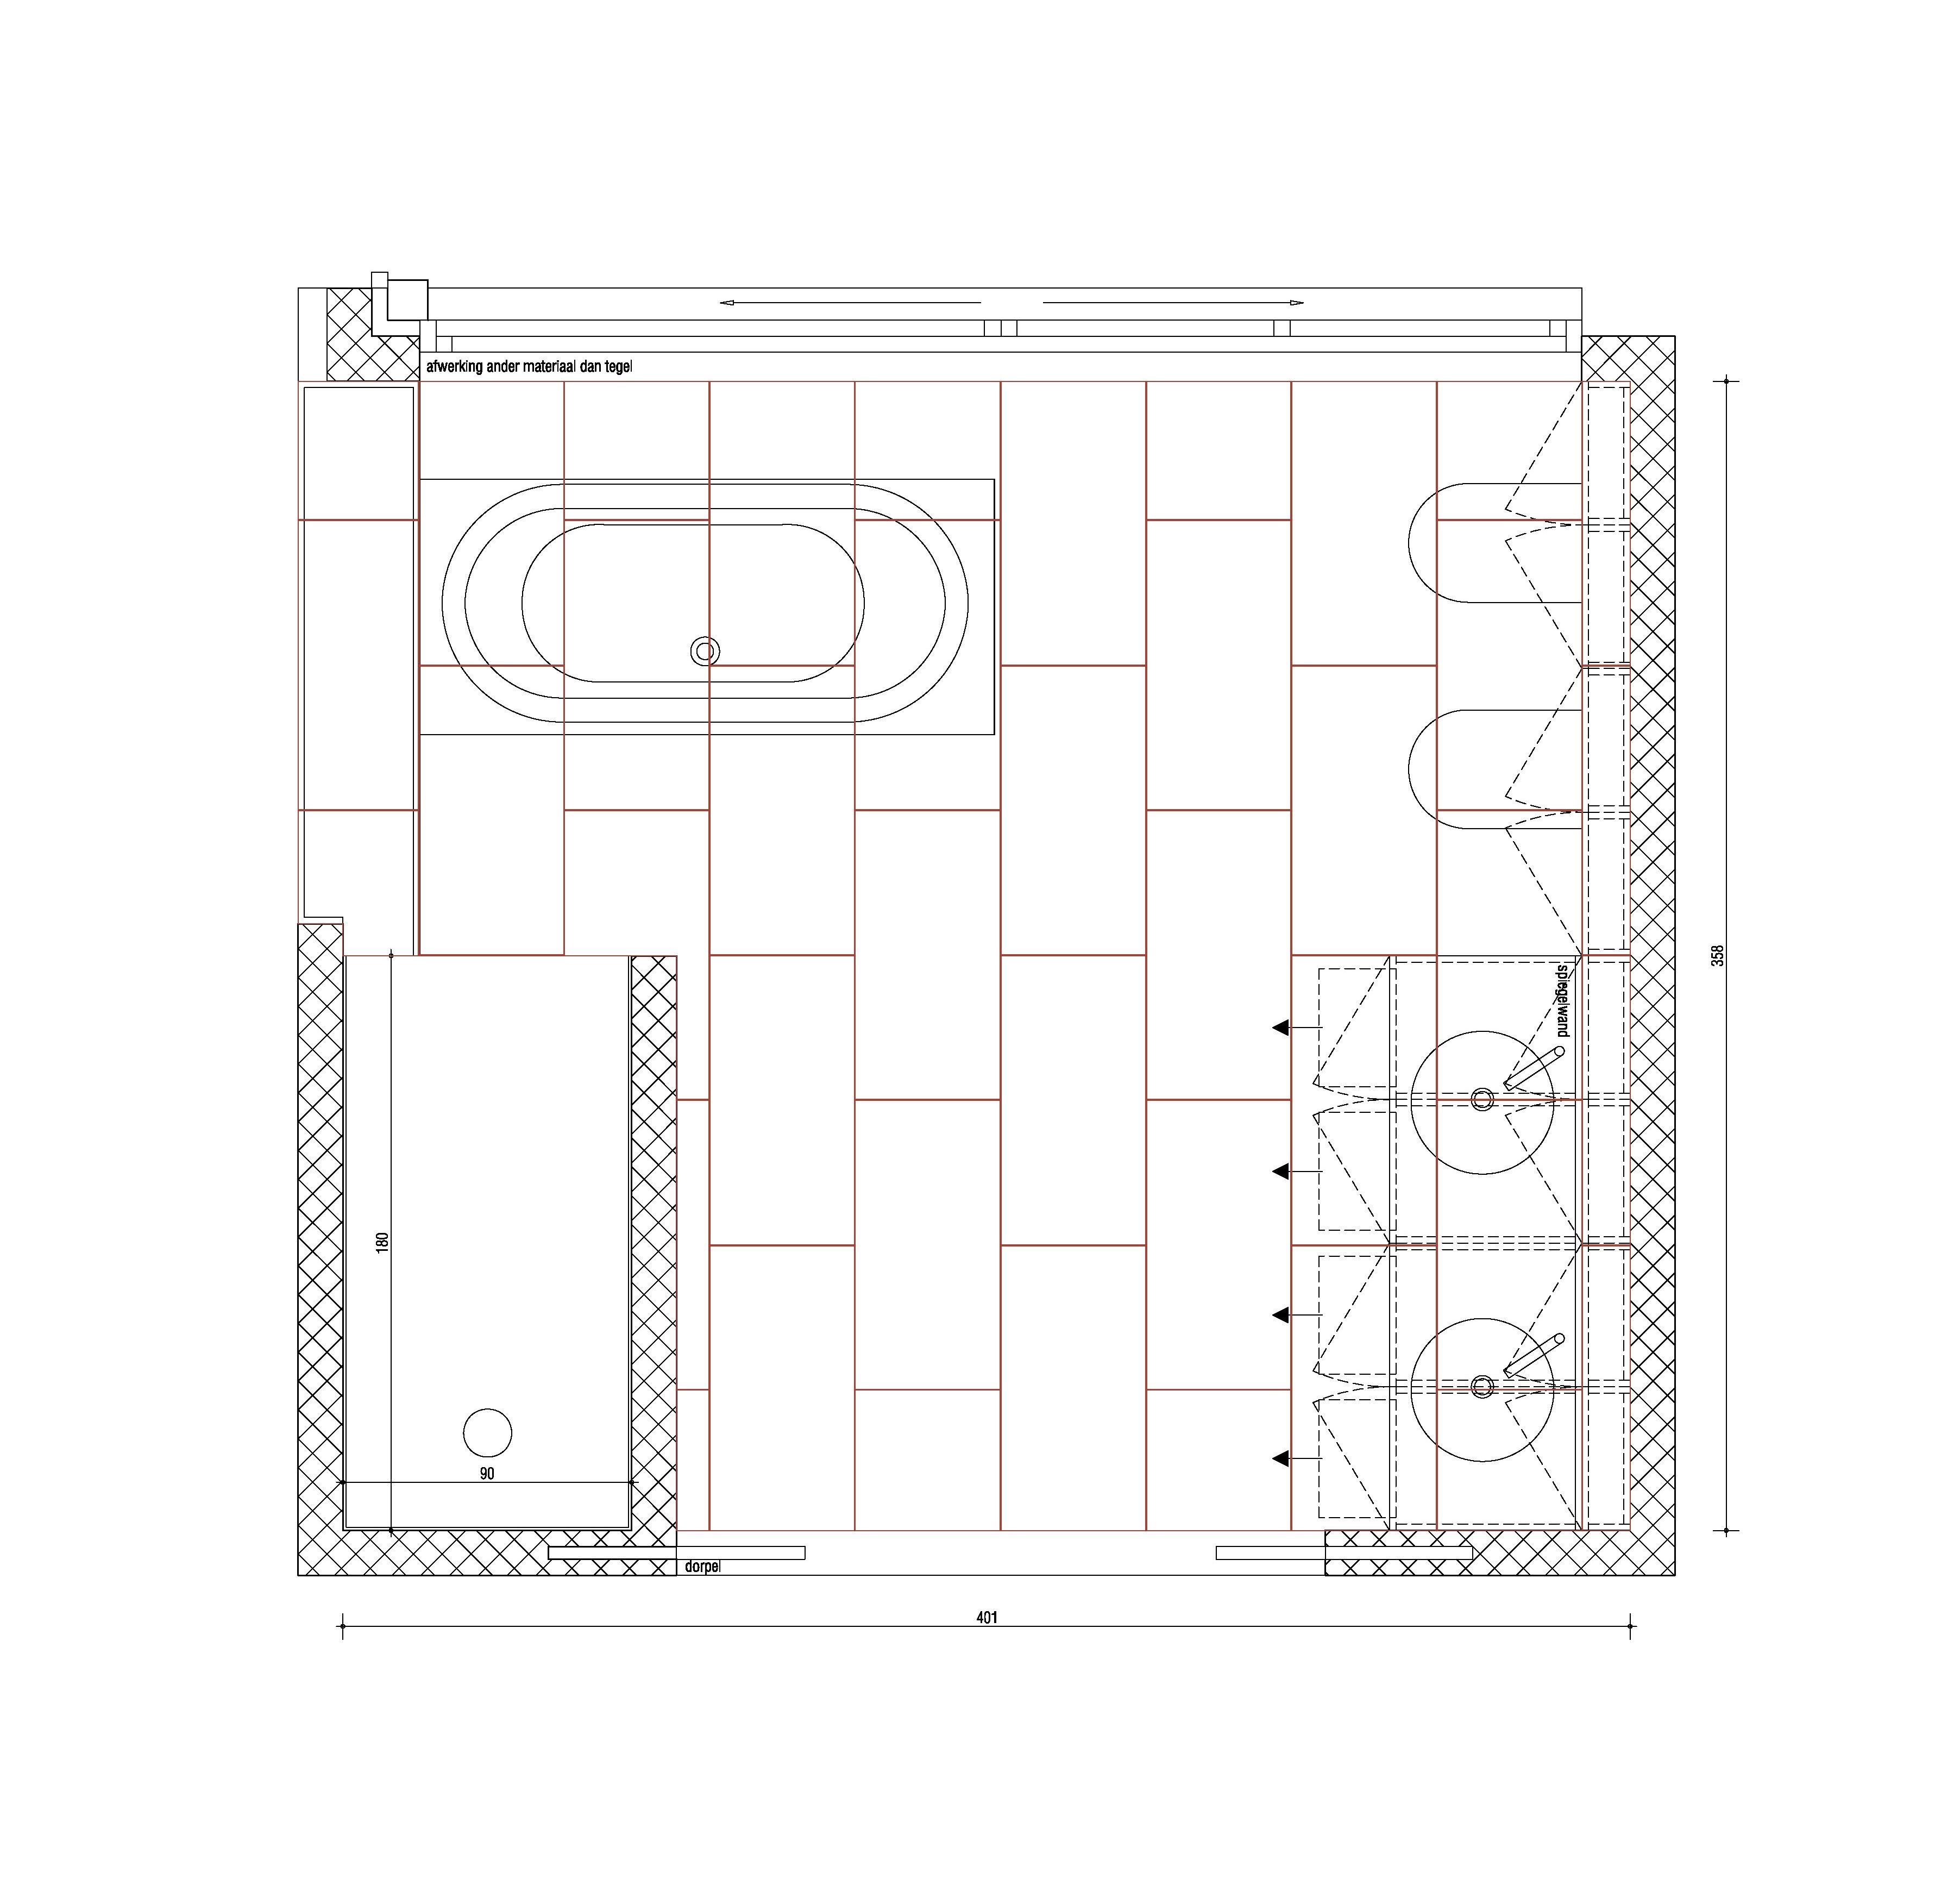 tegelplan vloer badkamer 1220laur stam 1220laur nieuwbouw